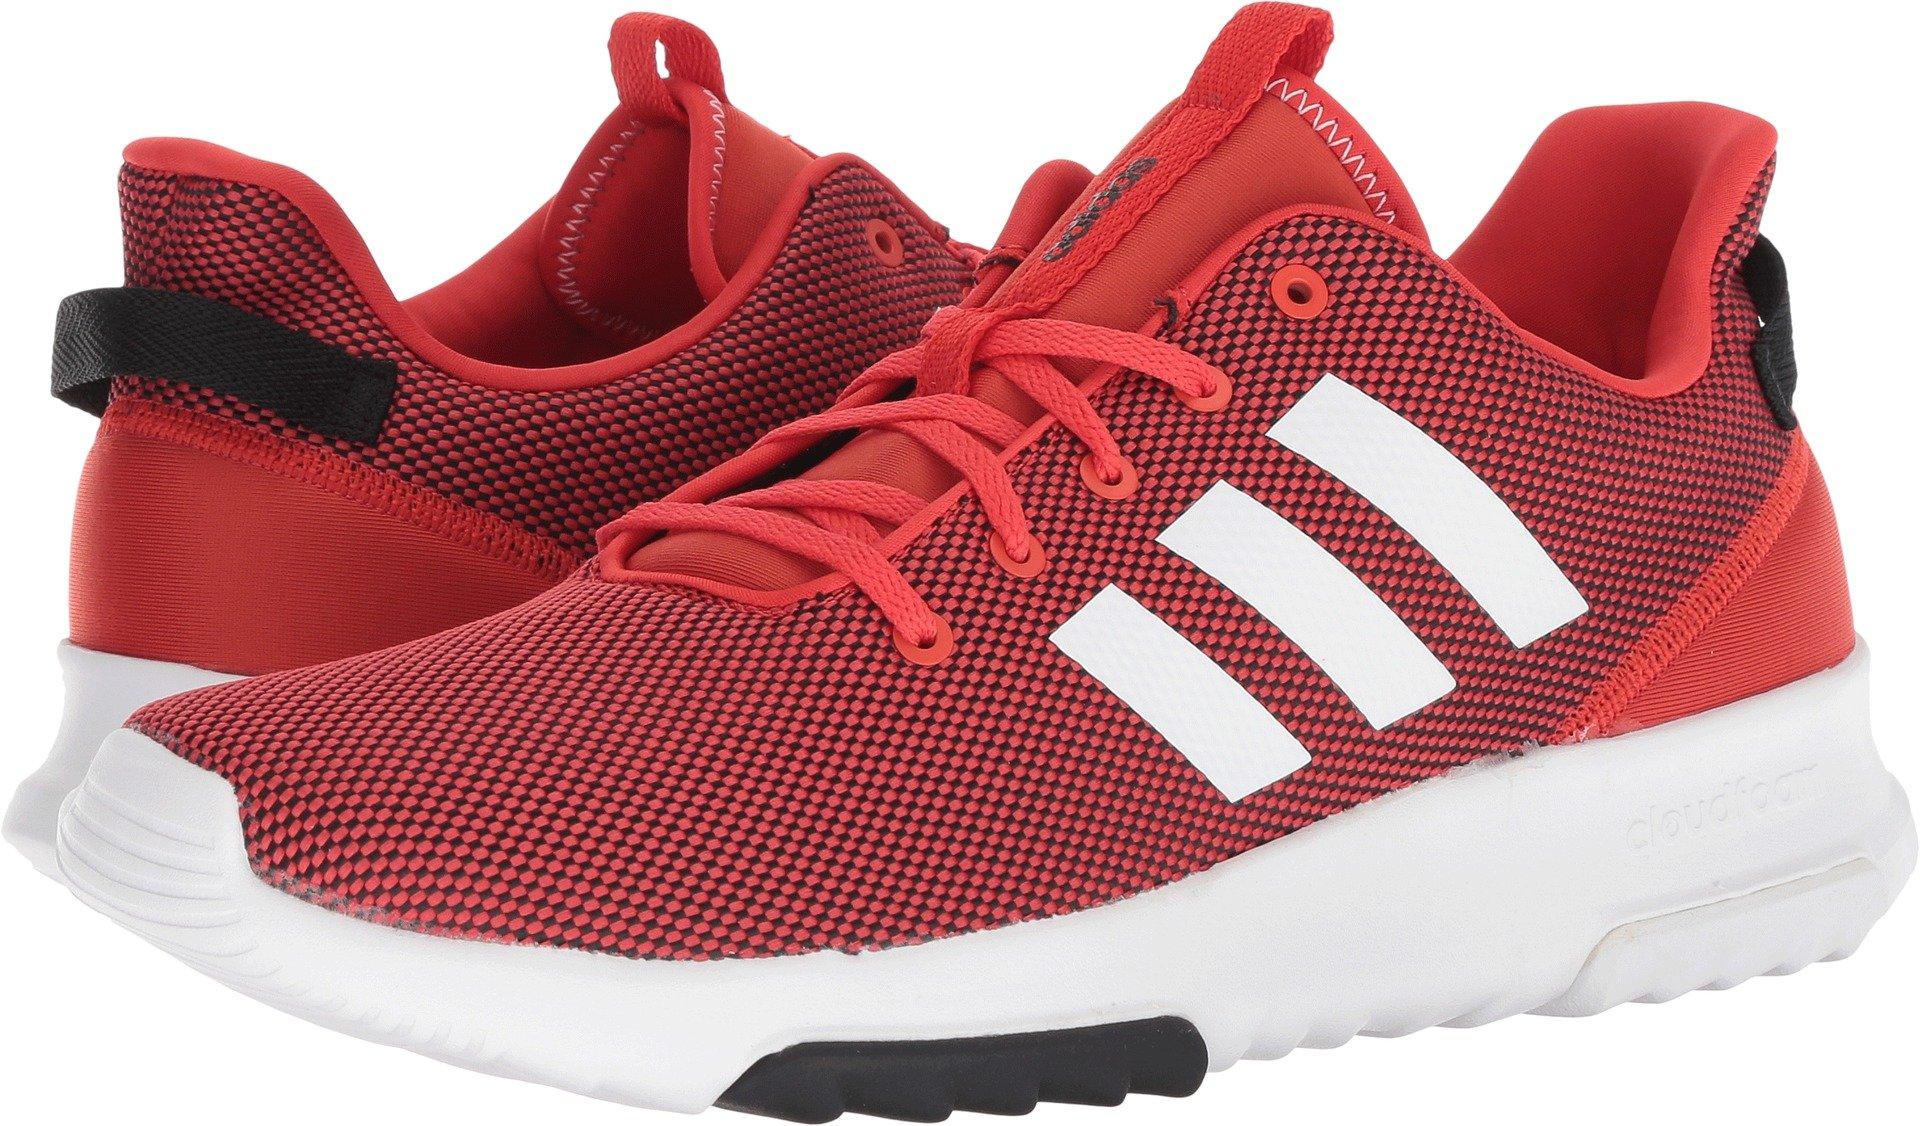 8f2cf29d5 Galleon - Adidas Men's Cloudfoam Racer TR Scarlet/Footwear White/Core Red  6.5 D US